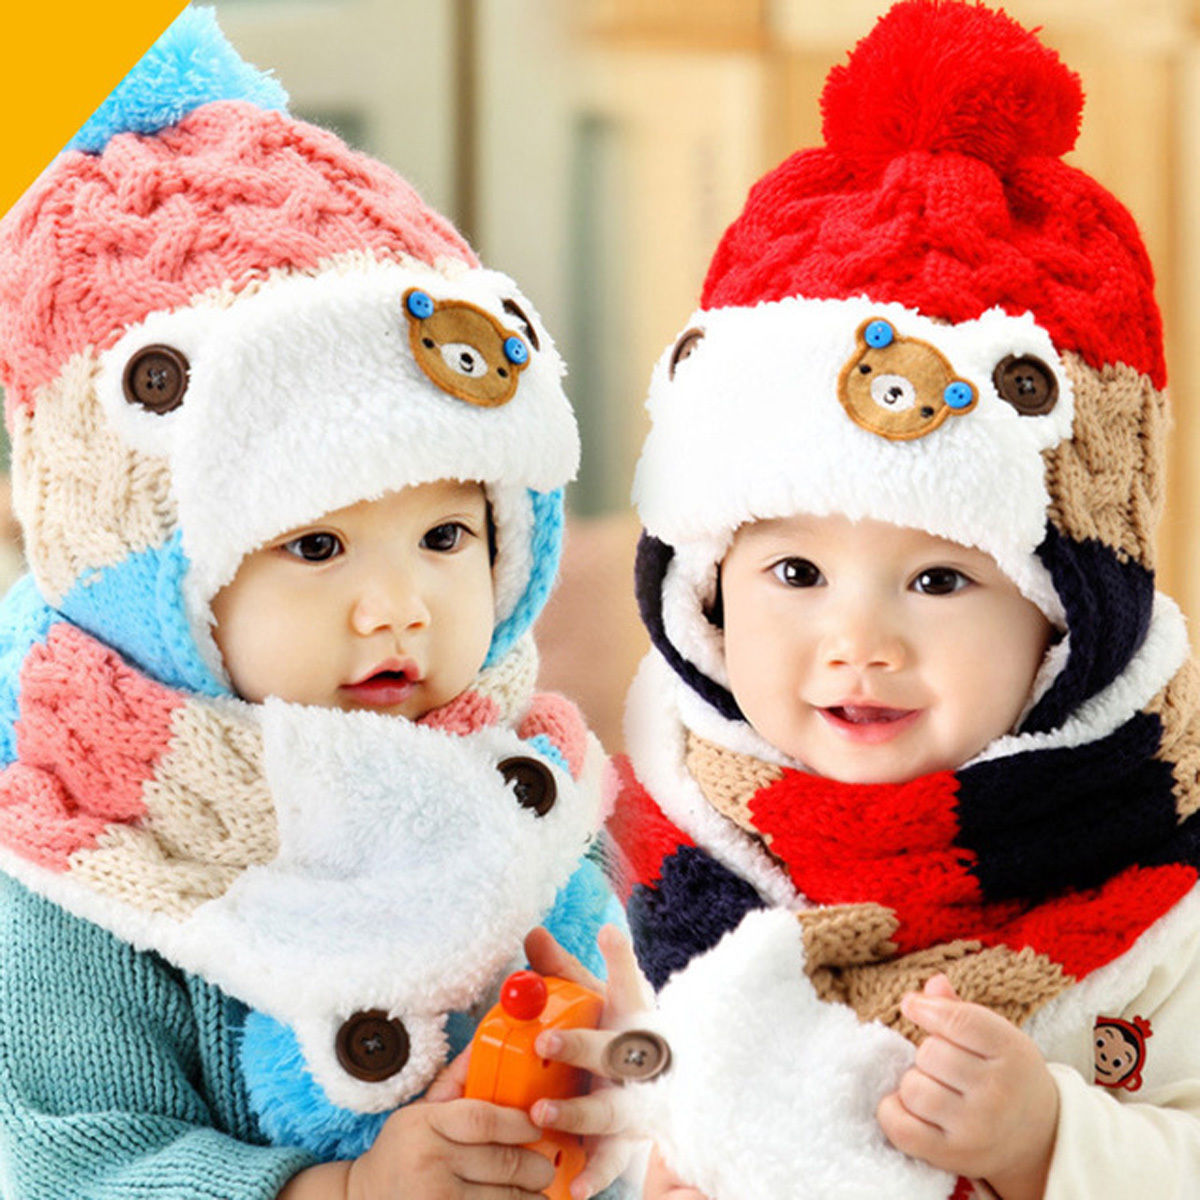 8.51 - Baby Toddler Winter Beanie Warm Hat Hooded Scarf Earflap Knitted  Cap Girls Boys  ebay  Fashion 460b3e6284f0